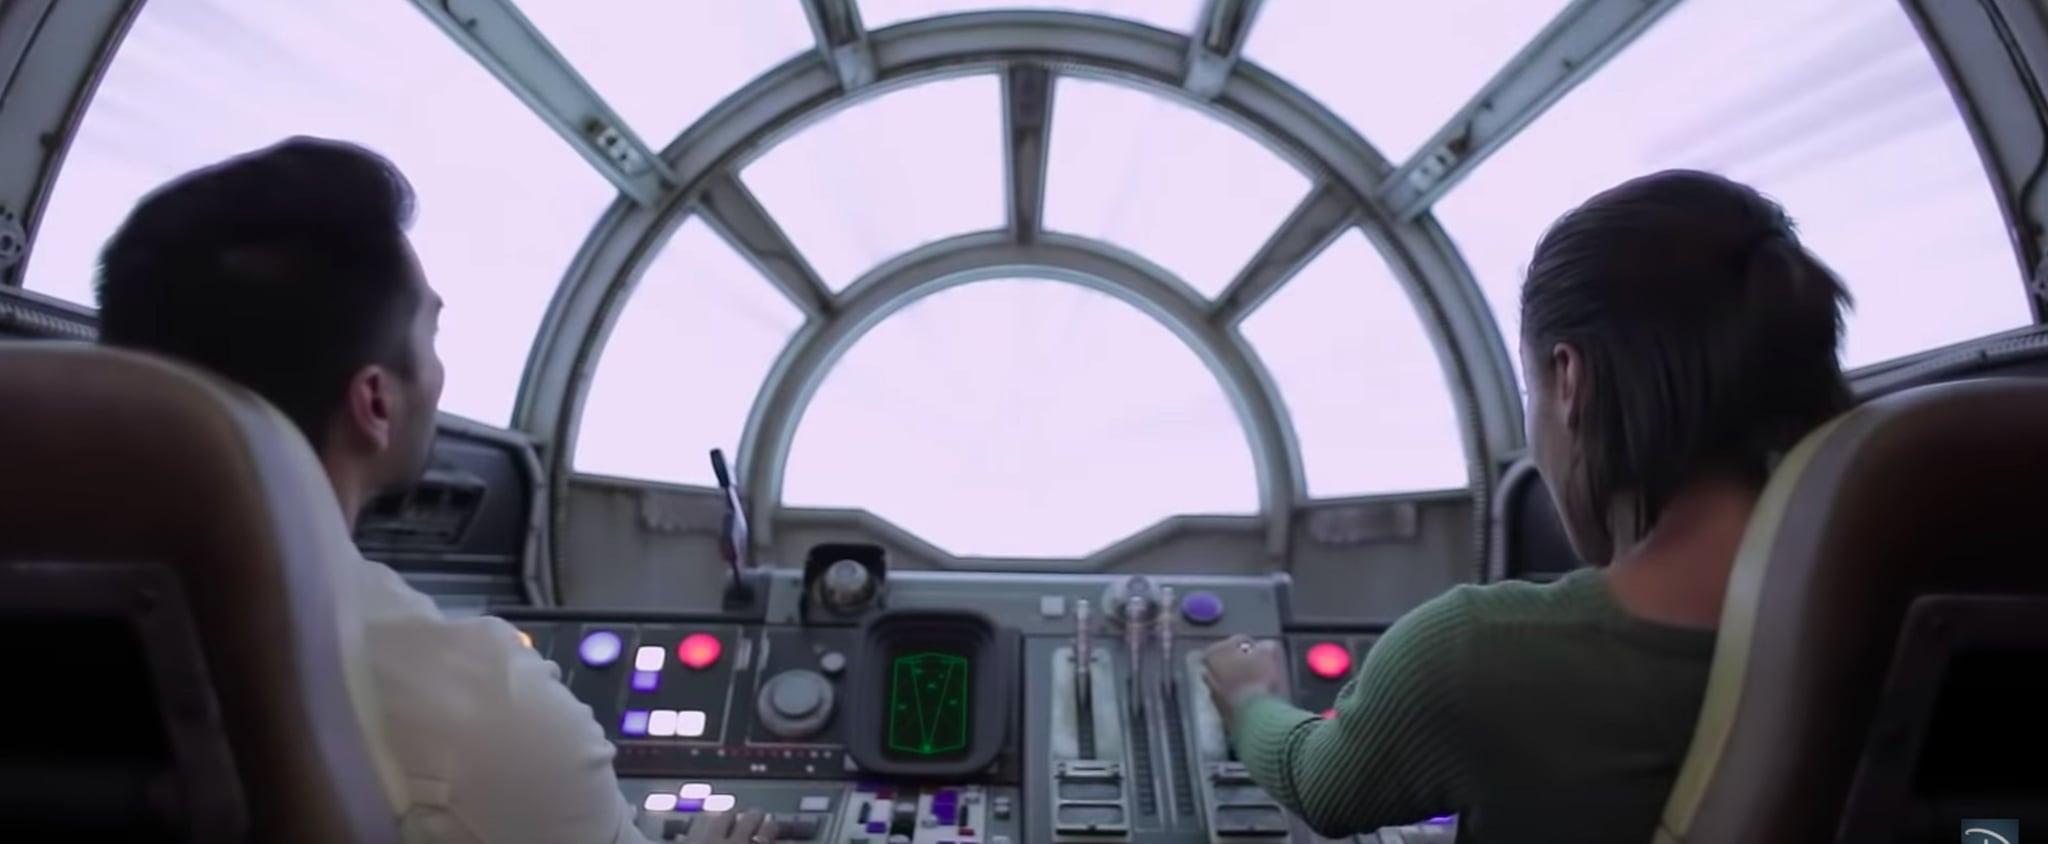 Disney Star Wars: Galaxy's Edge Attractions